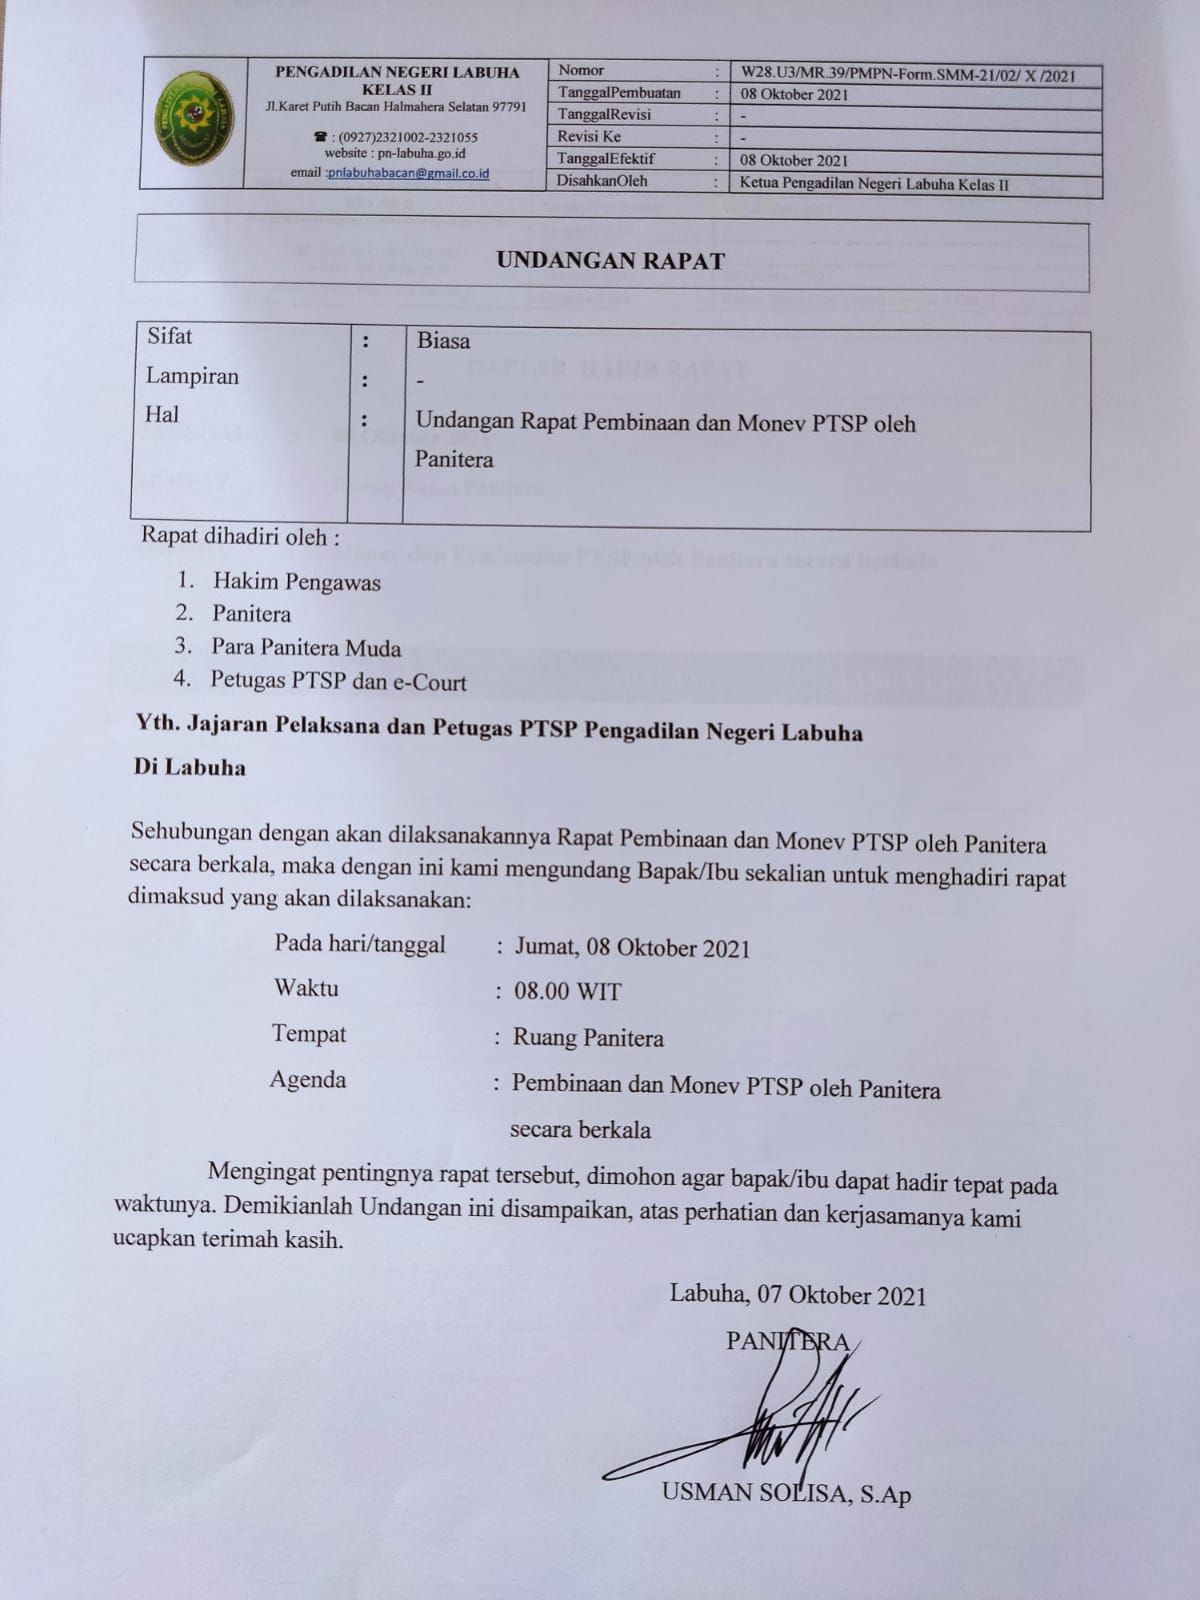 Undangan Rapat Pembinaan dan Monev PTSP oleh Panitera Bulan Oktober